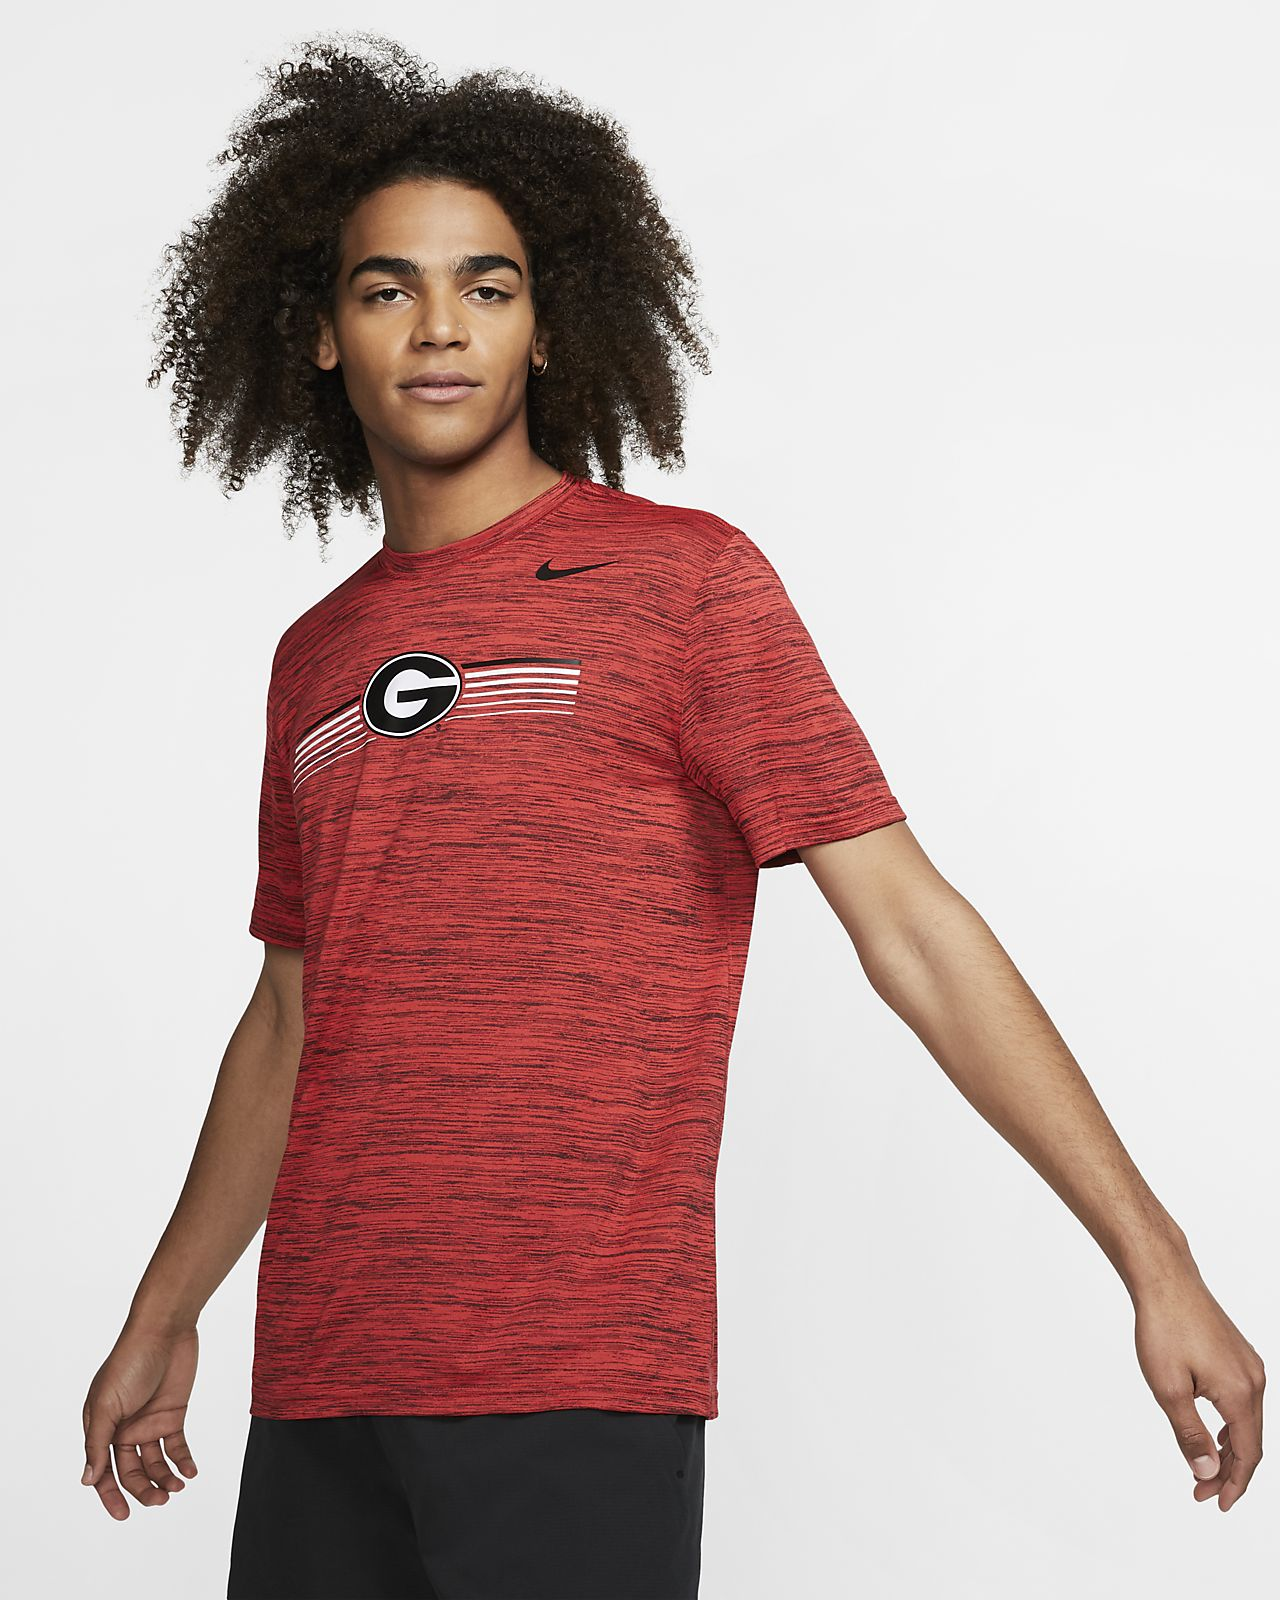 Nike College Dri-FIT Legend Velocity (Georgia) Men's T-Shirt